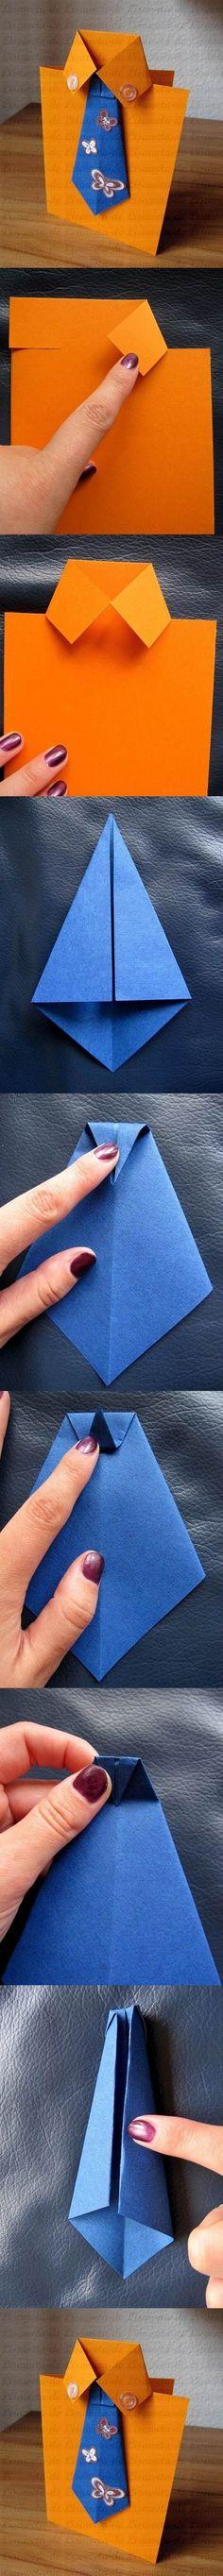 DIY Tie and Shirt Greeting Card | iCreativeIdeas.com Like Us on Facebook == https://www.facebook.com/icreativeideas